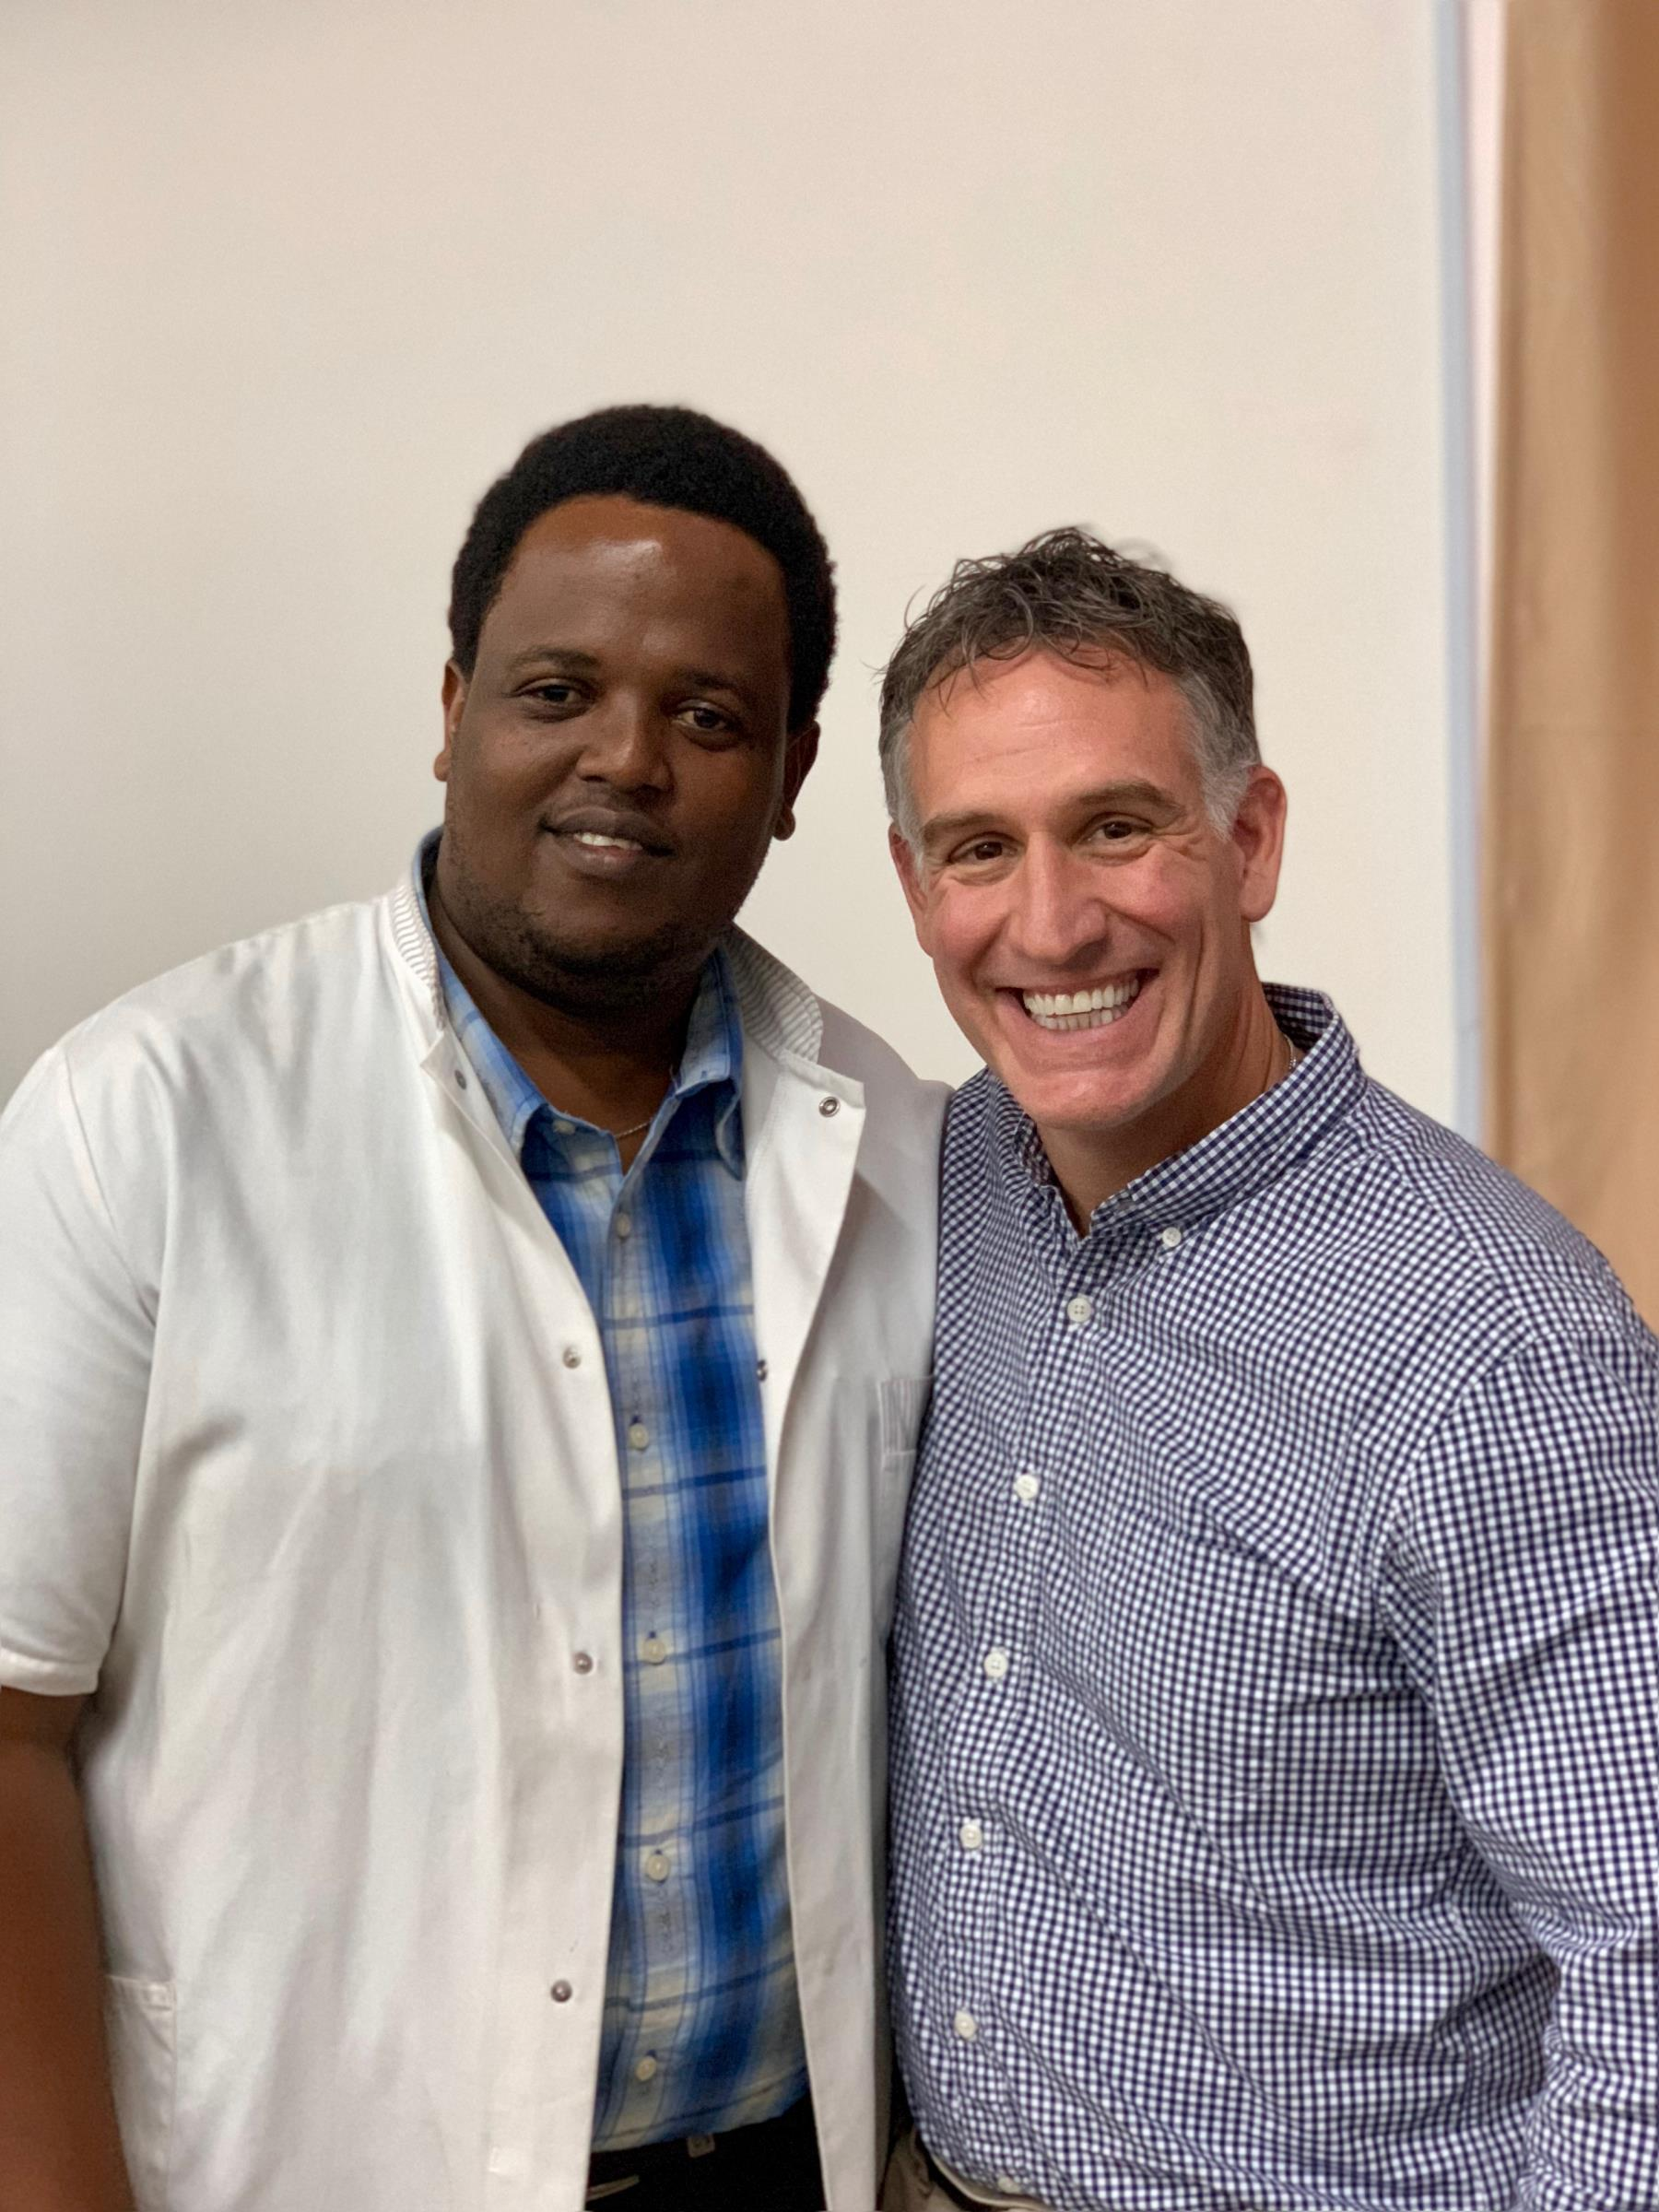 Tanzanian IR resident Dr. Erick Mbuguje with visiting IR faculty Dr. David Prologo from Emory.